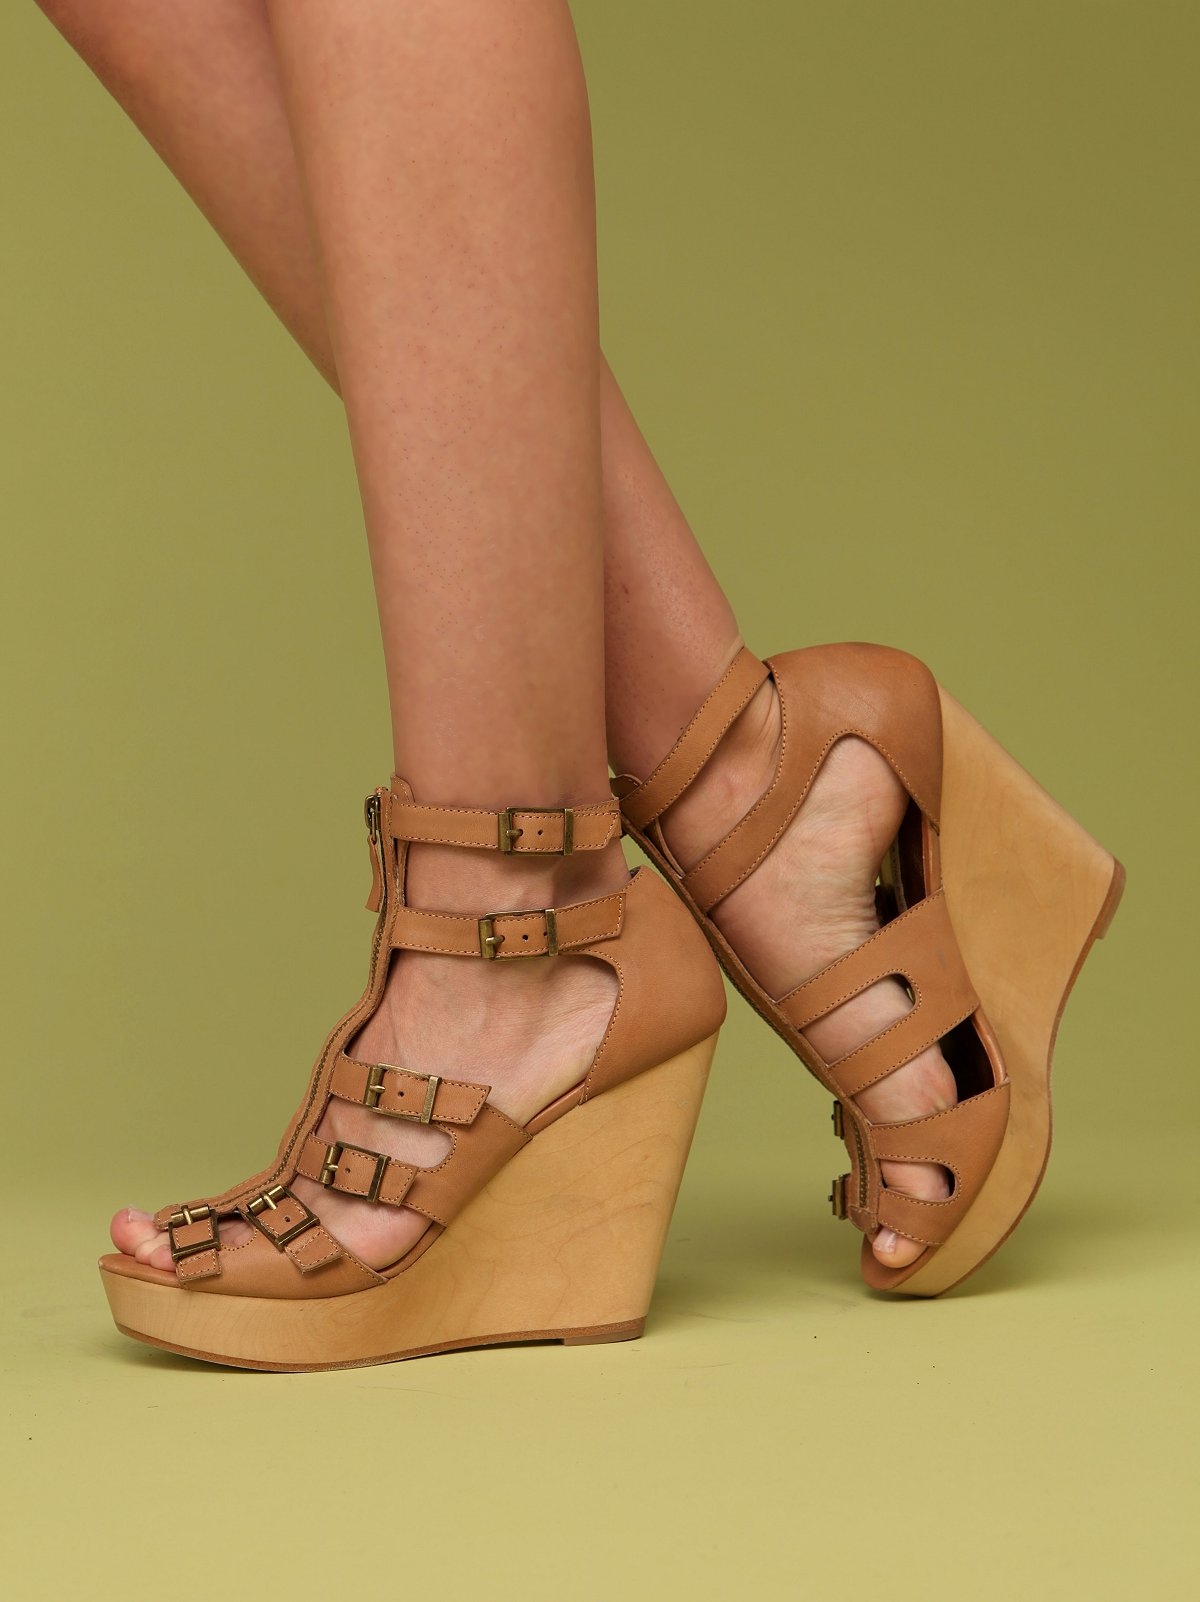 Luella Zip Front Platform by Cynthia Vincent